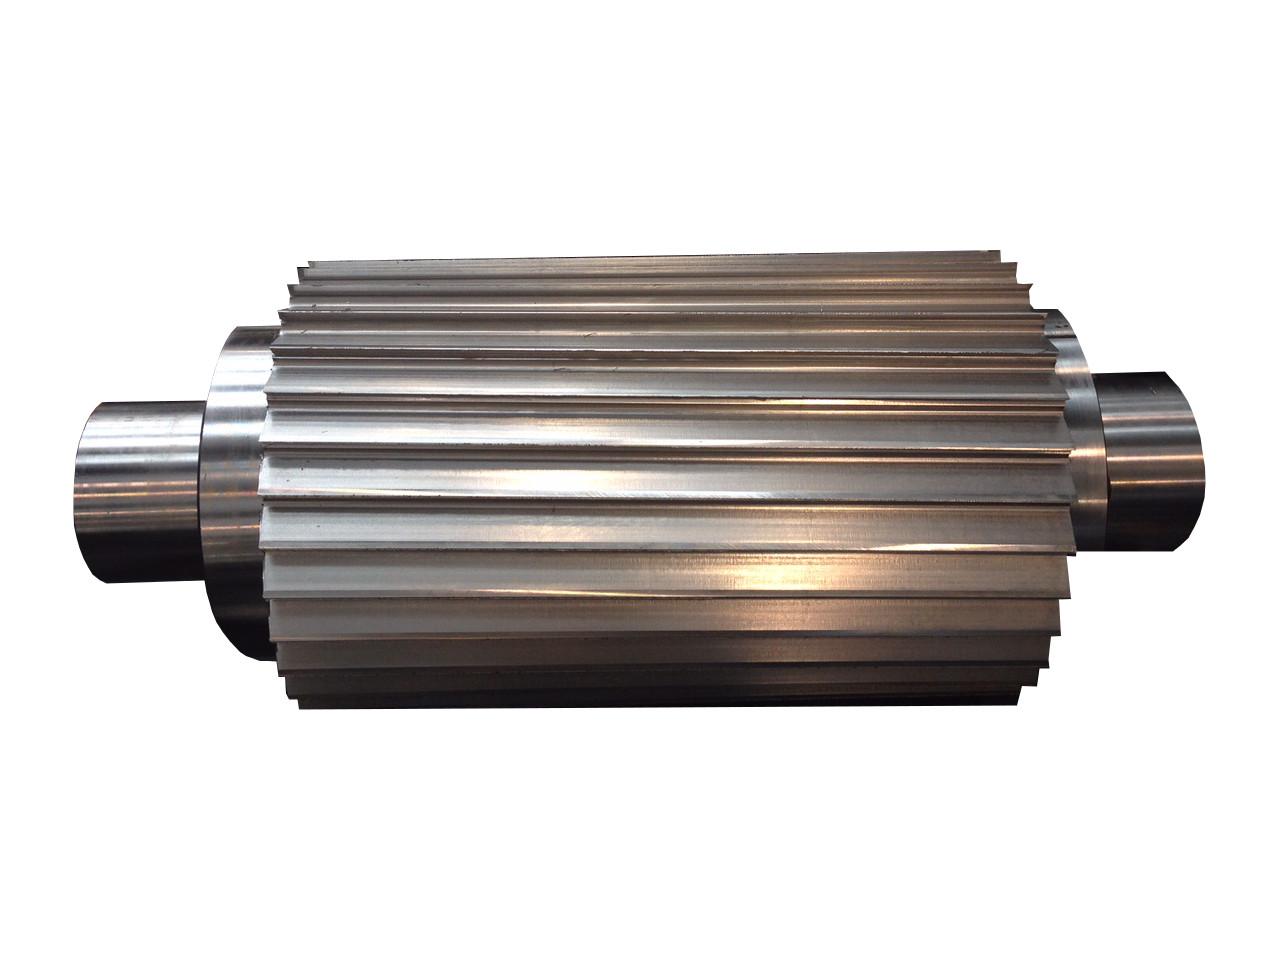 Rotor Cutter